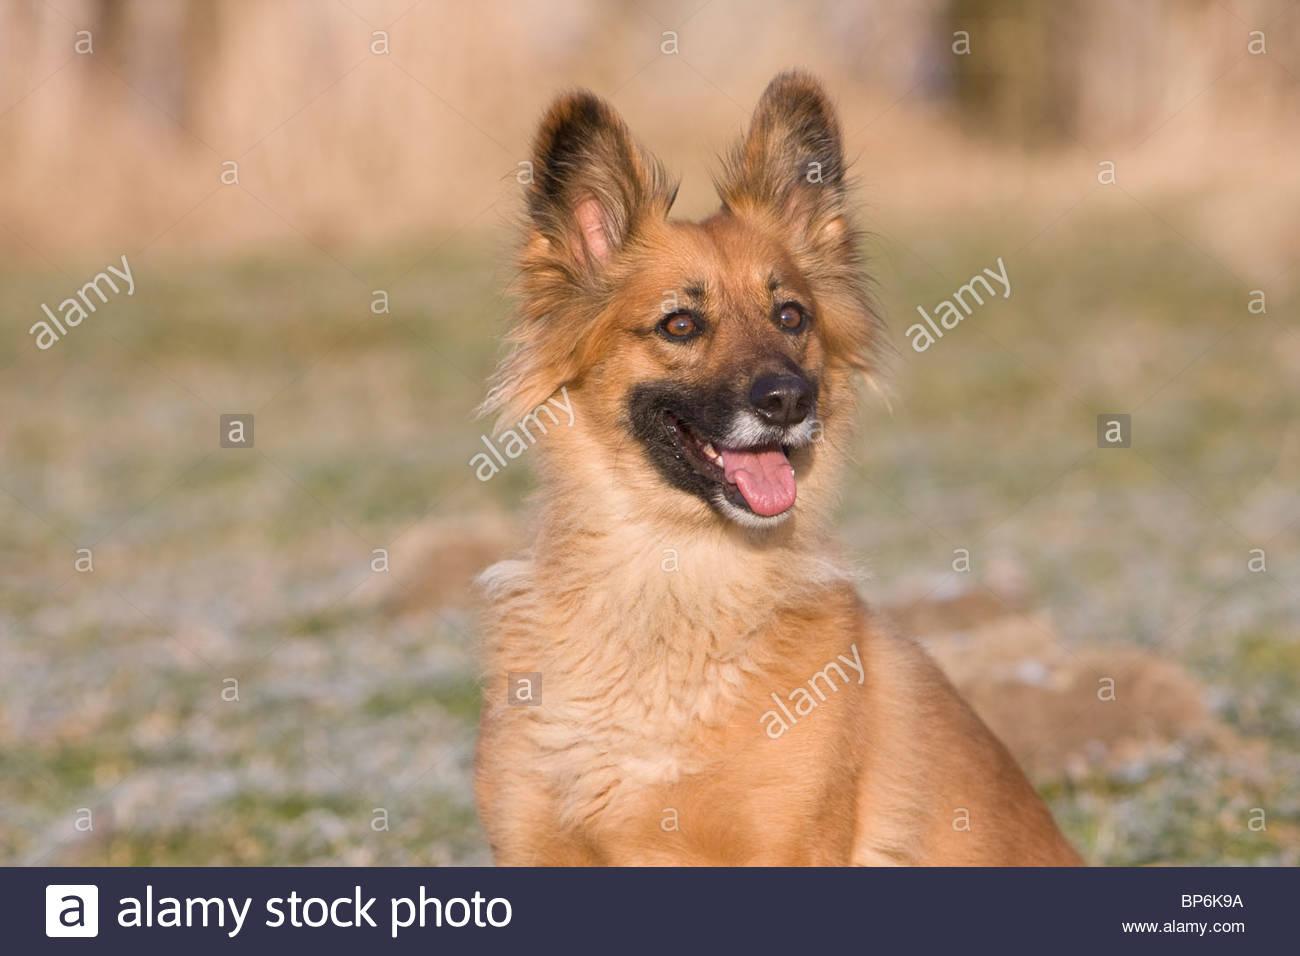 An alert sandy coloured dog - Stock Image